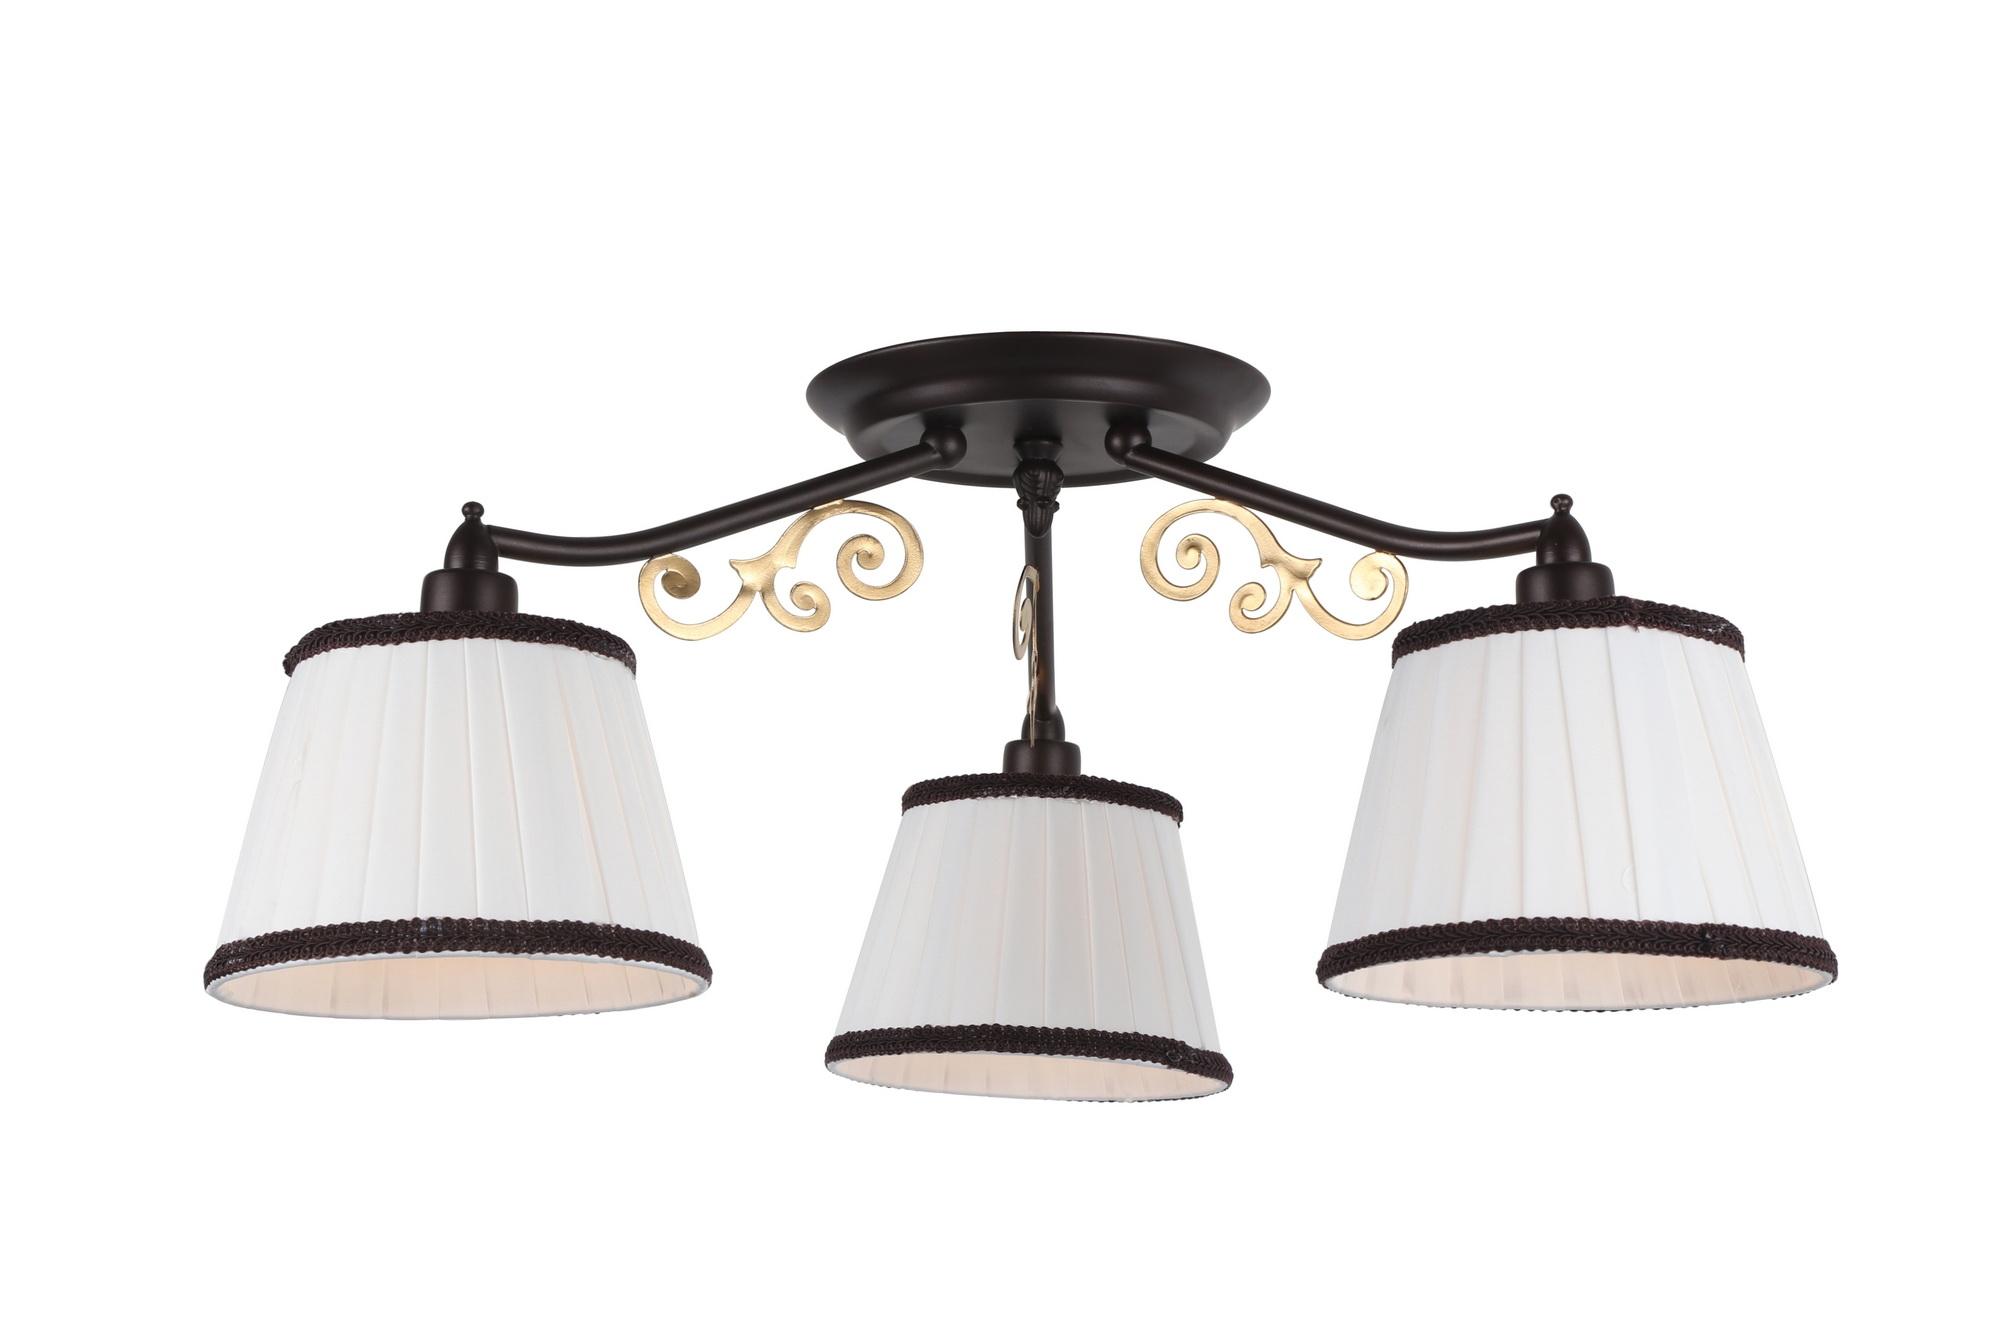 Люстра Arte lamp Capri a6344pl-3br